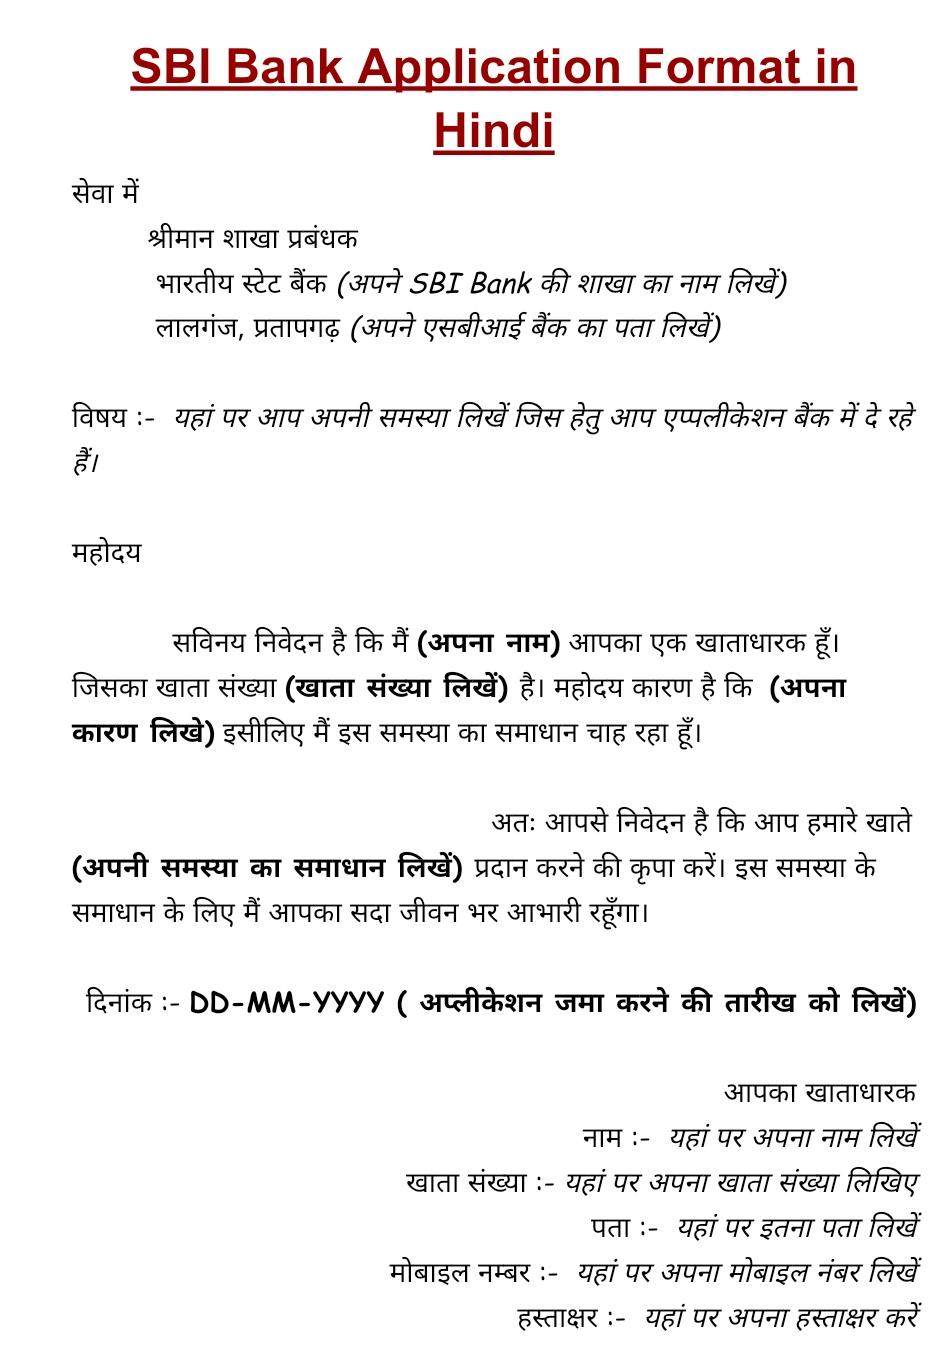 state-bank-application-format-in-hindi, sbi-application-format-in-hindi